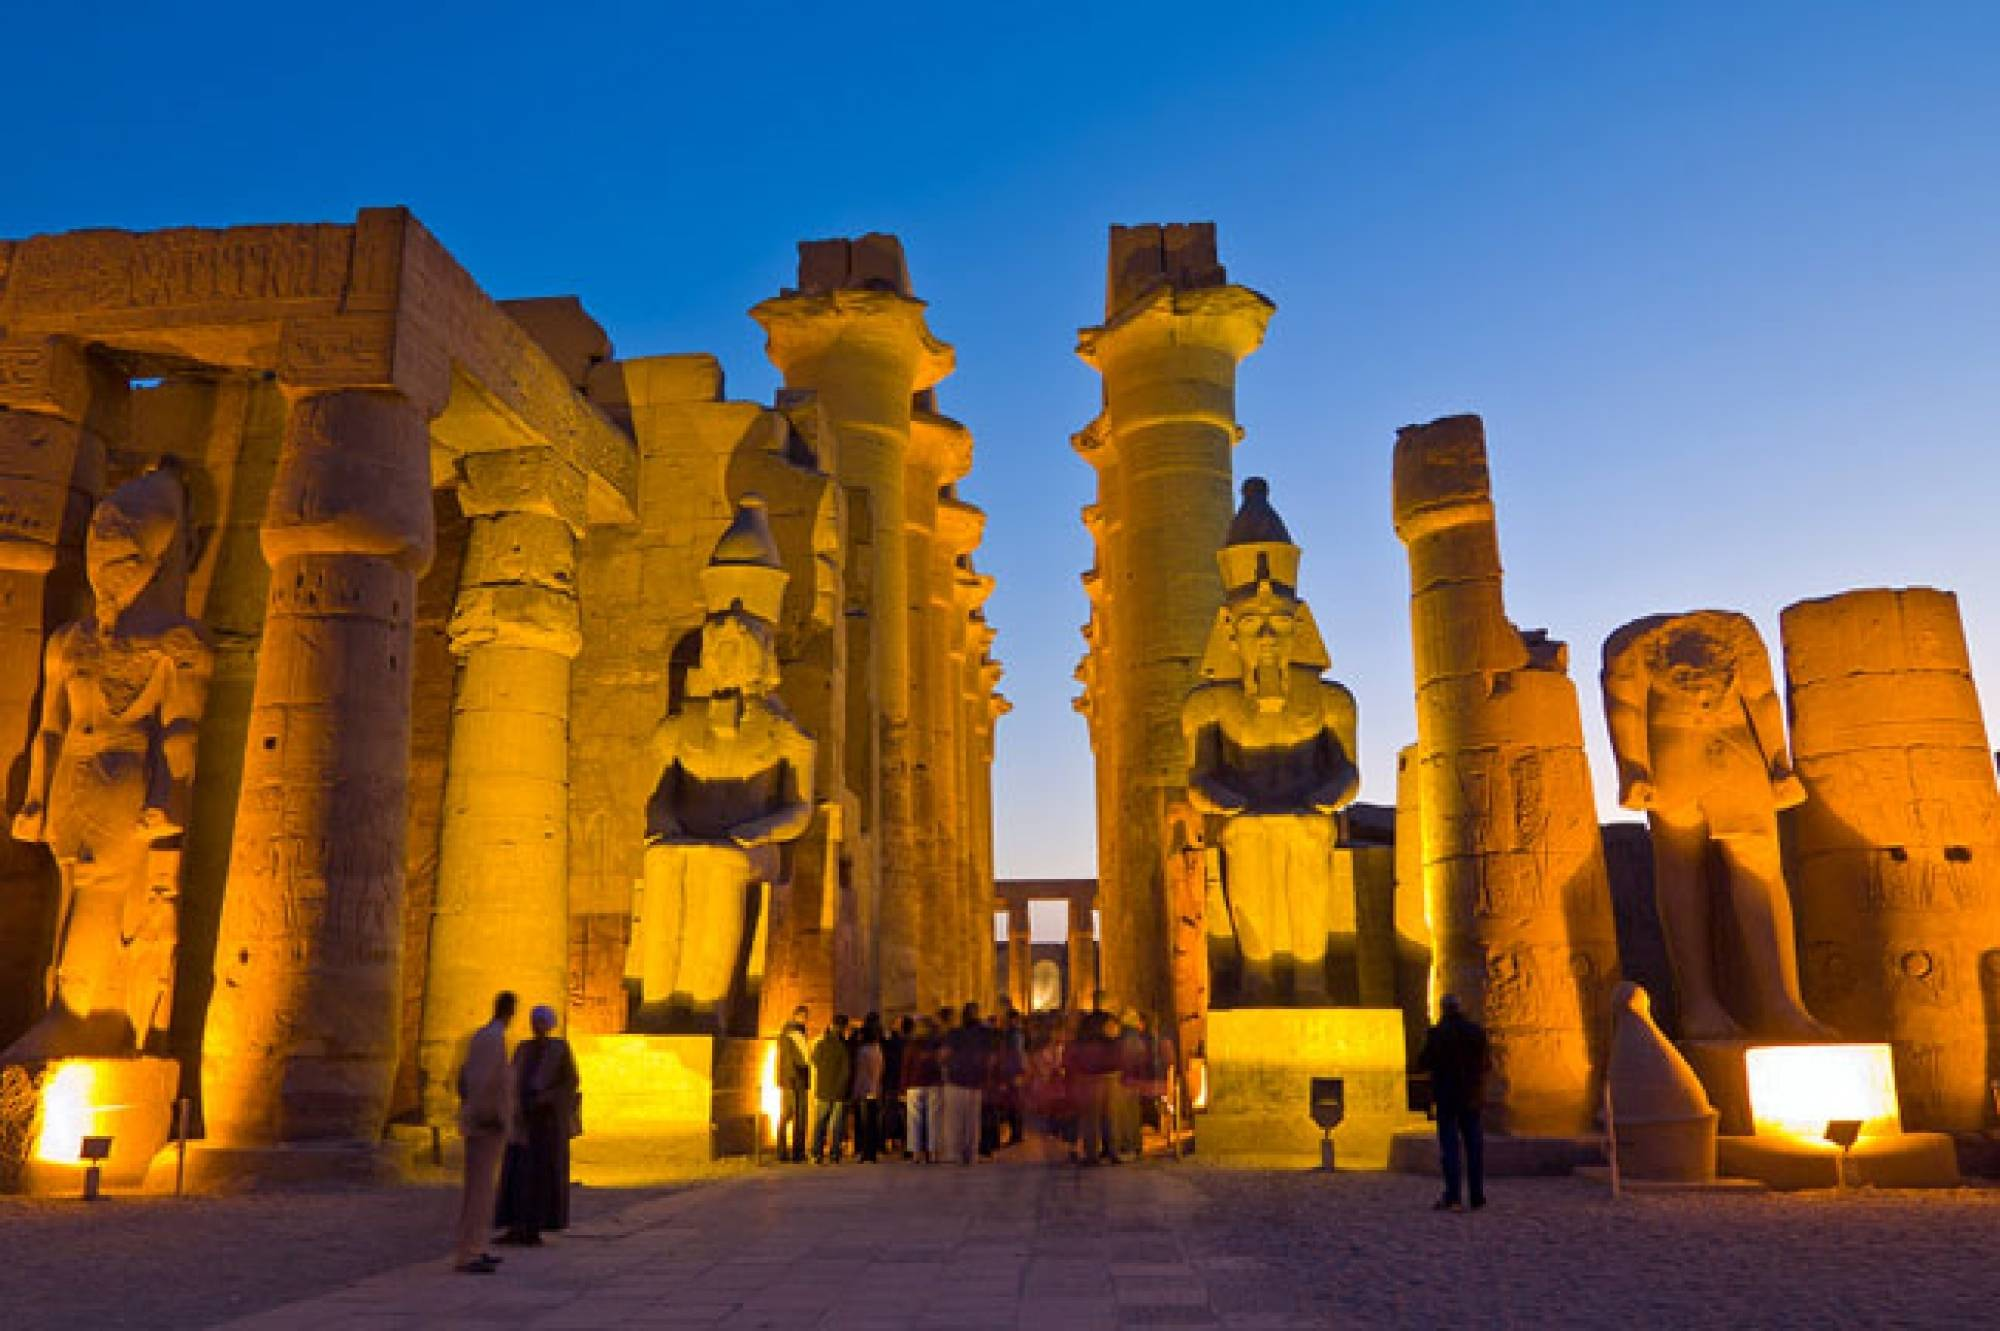 Aswan and Luxor, Egypt